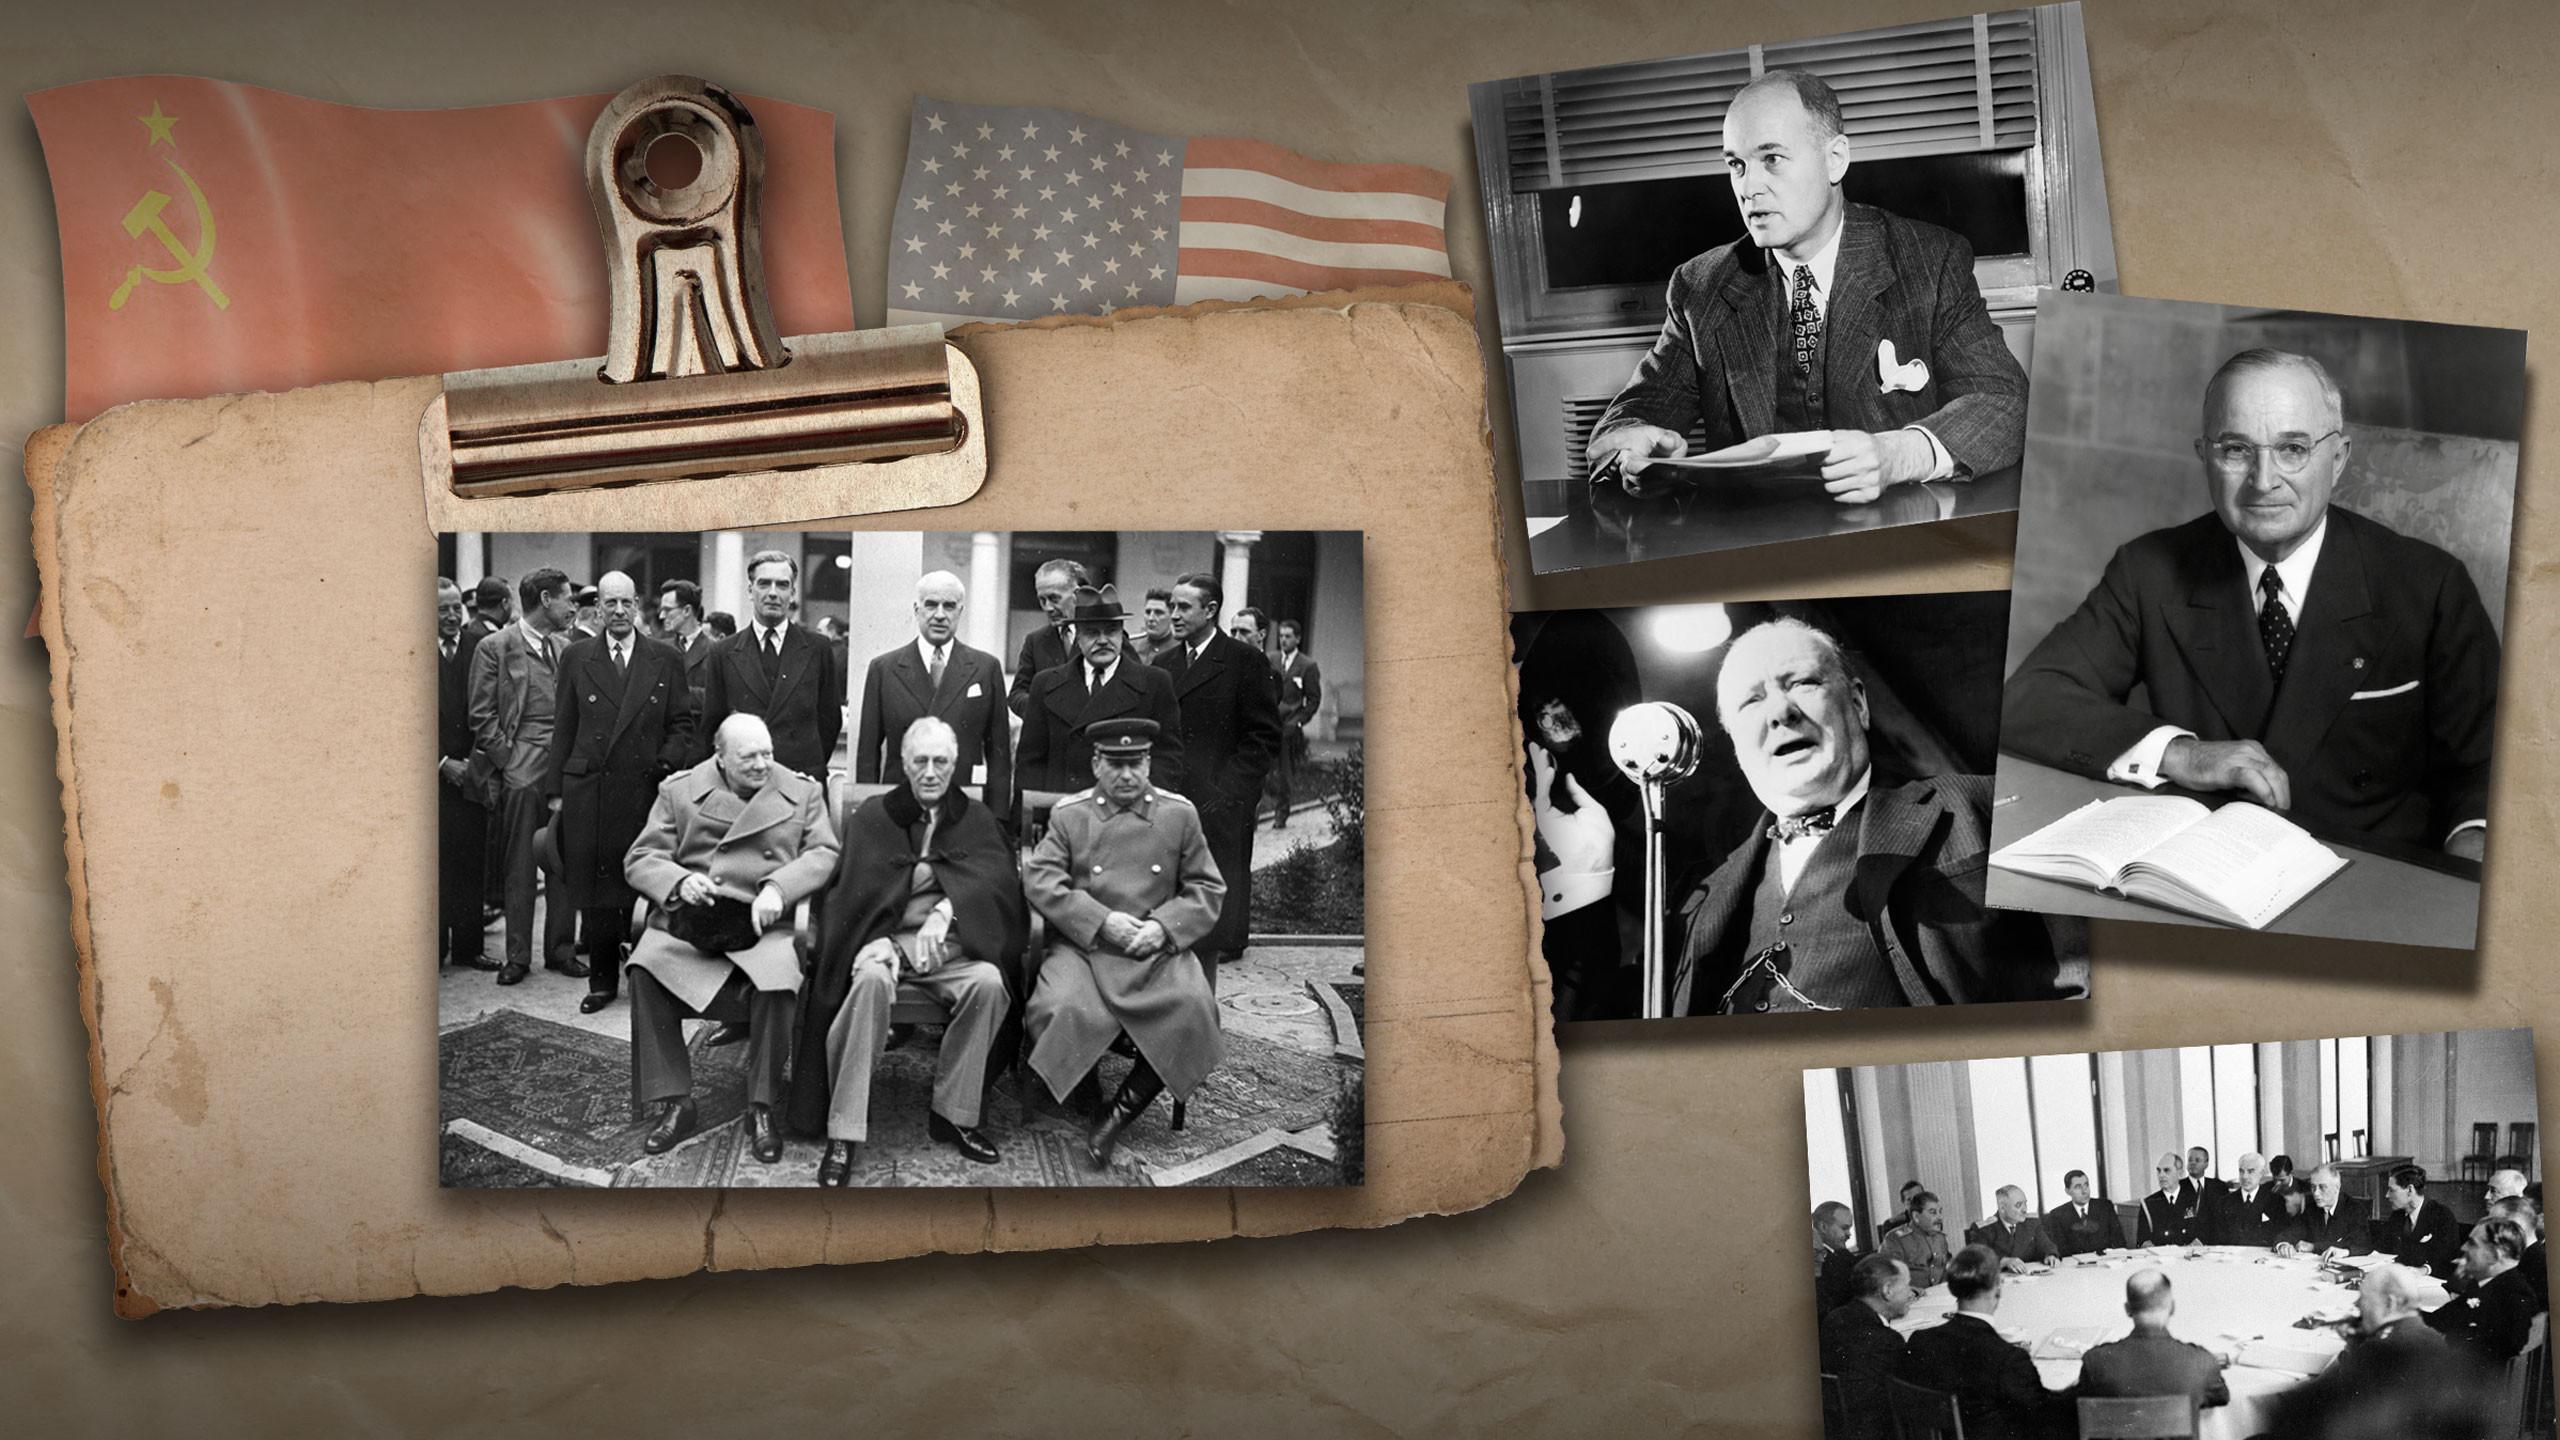 Невидимая граница: как 75 лет назад началась холодная война